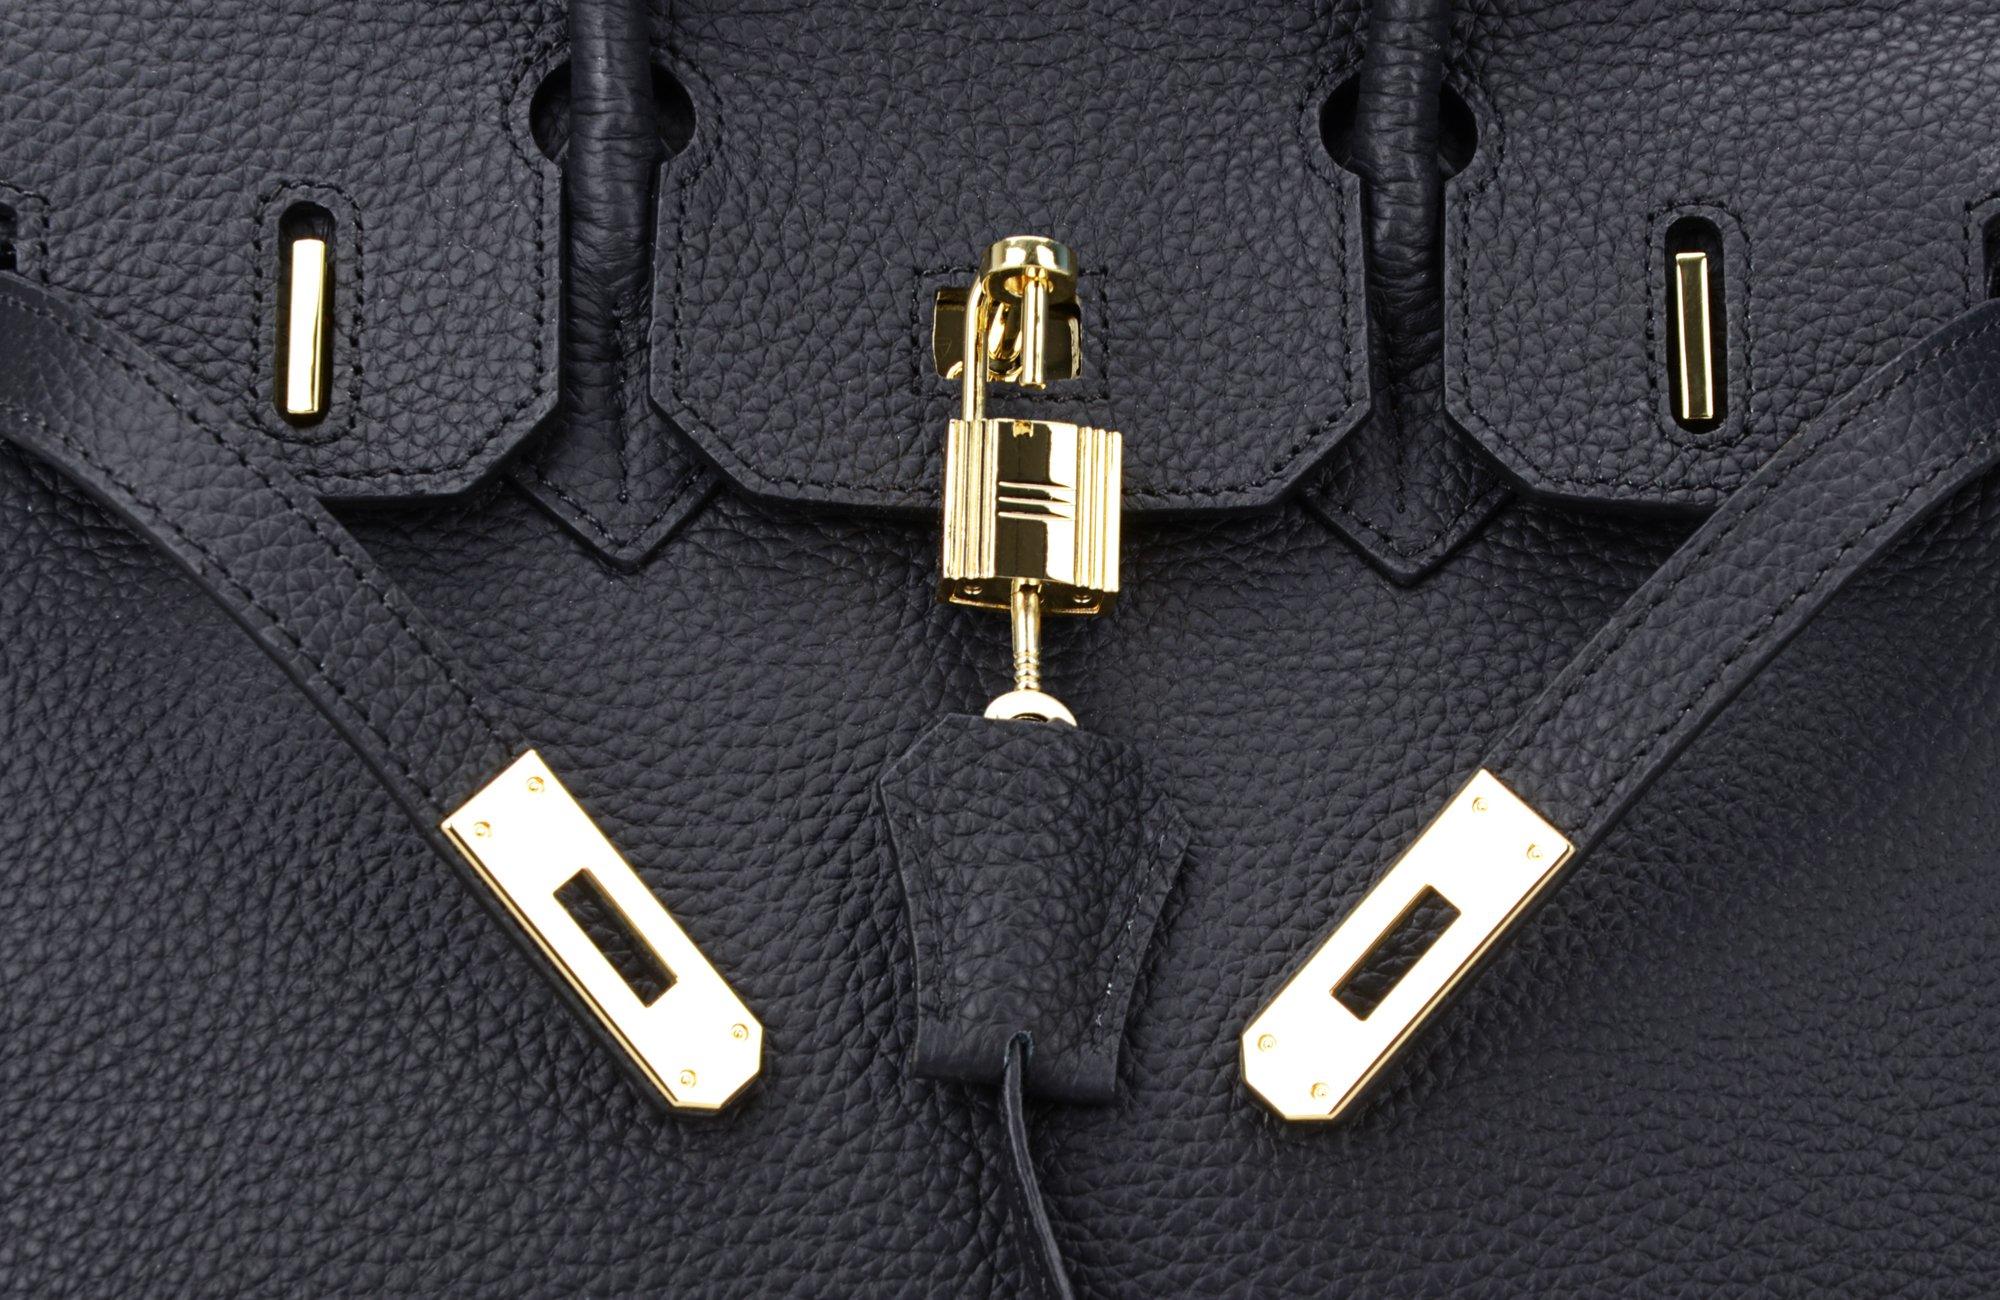 Cherish Kiss Women's Classic Genuine Leather Tote Padlock Handbags H35 (35CM, Black) by Cherish Kiss (Image #7)